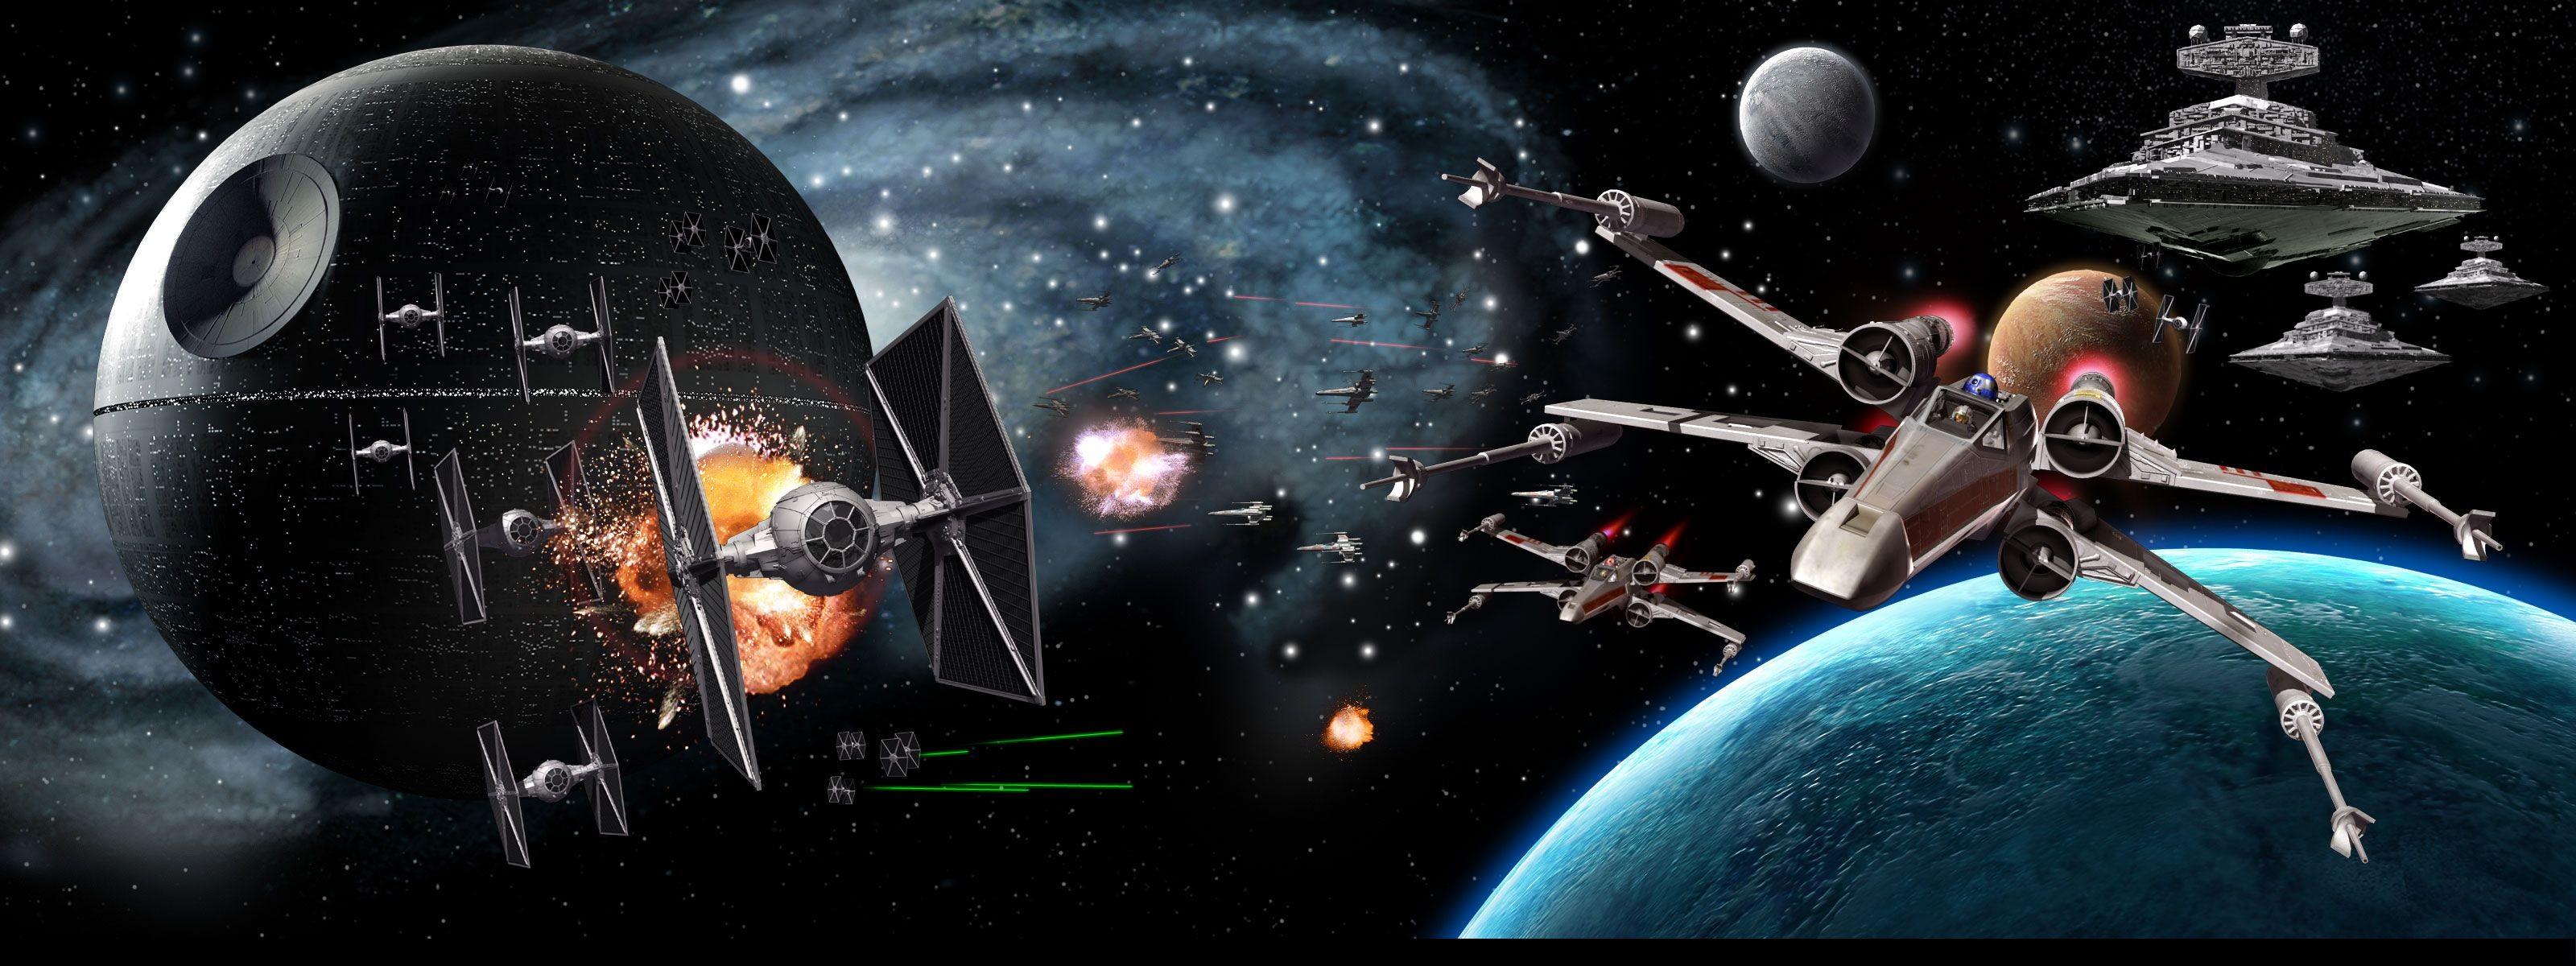 Star Wars Triple Screen Wallpaper 19 Images